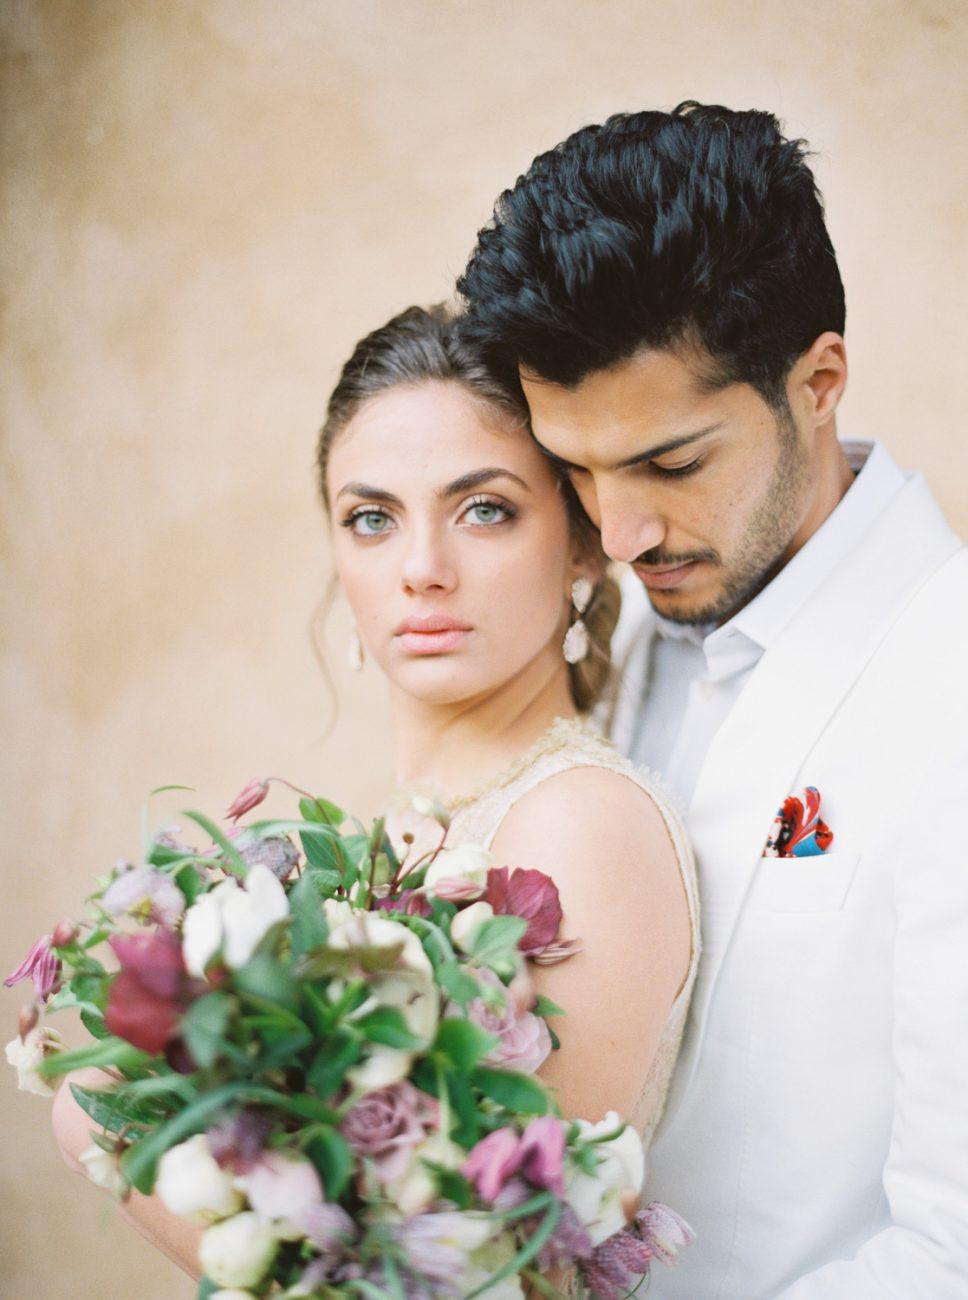 Carlos-Hernandez-Wedding-Film-Photography-Italy-Tuscany-Florence-010